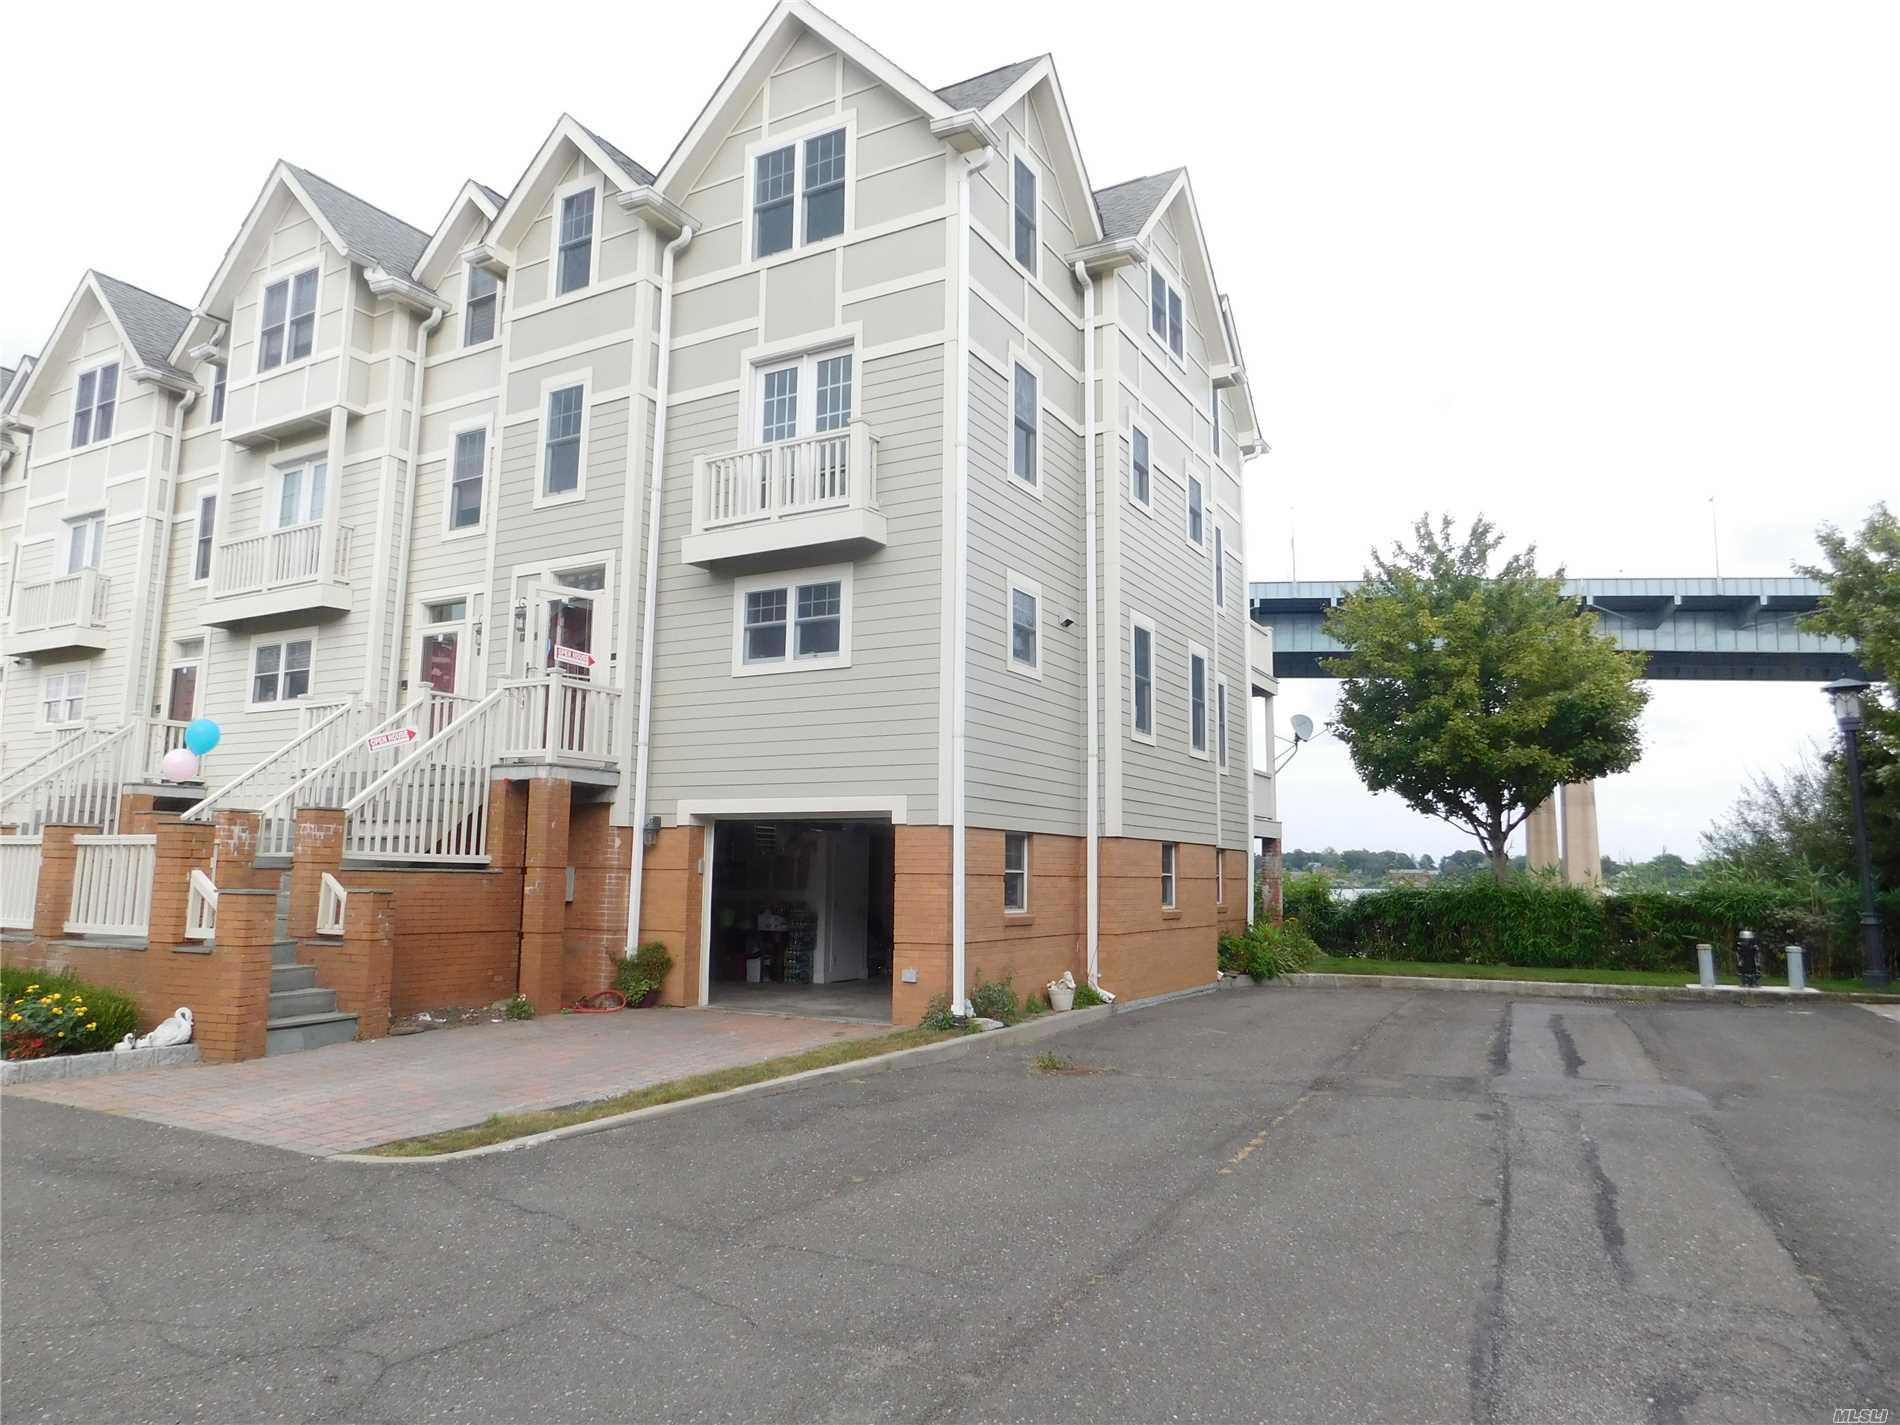 Property for sale at 168-42 Powell Cove Blvd # 19, Whitestone NY 11357, Whitestone,  New York 11357